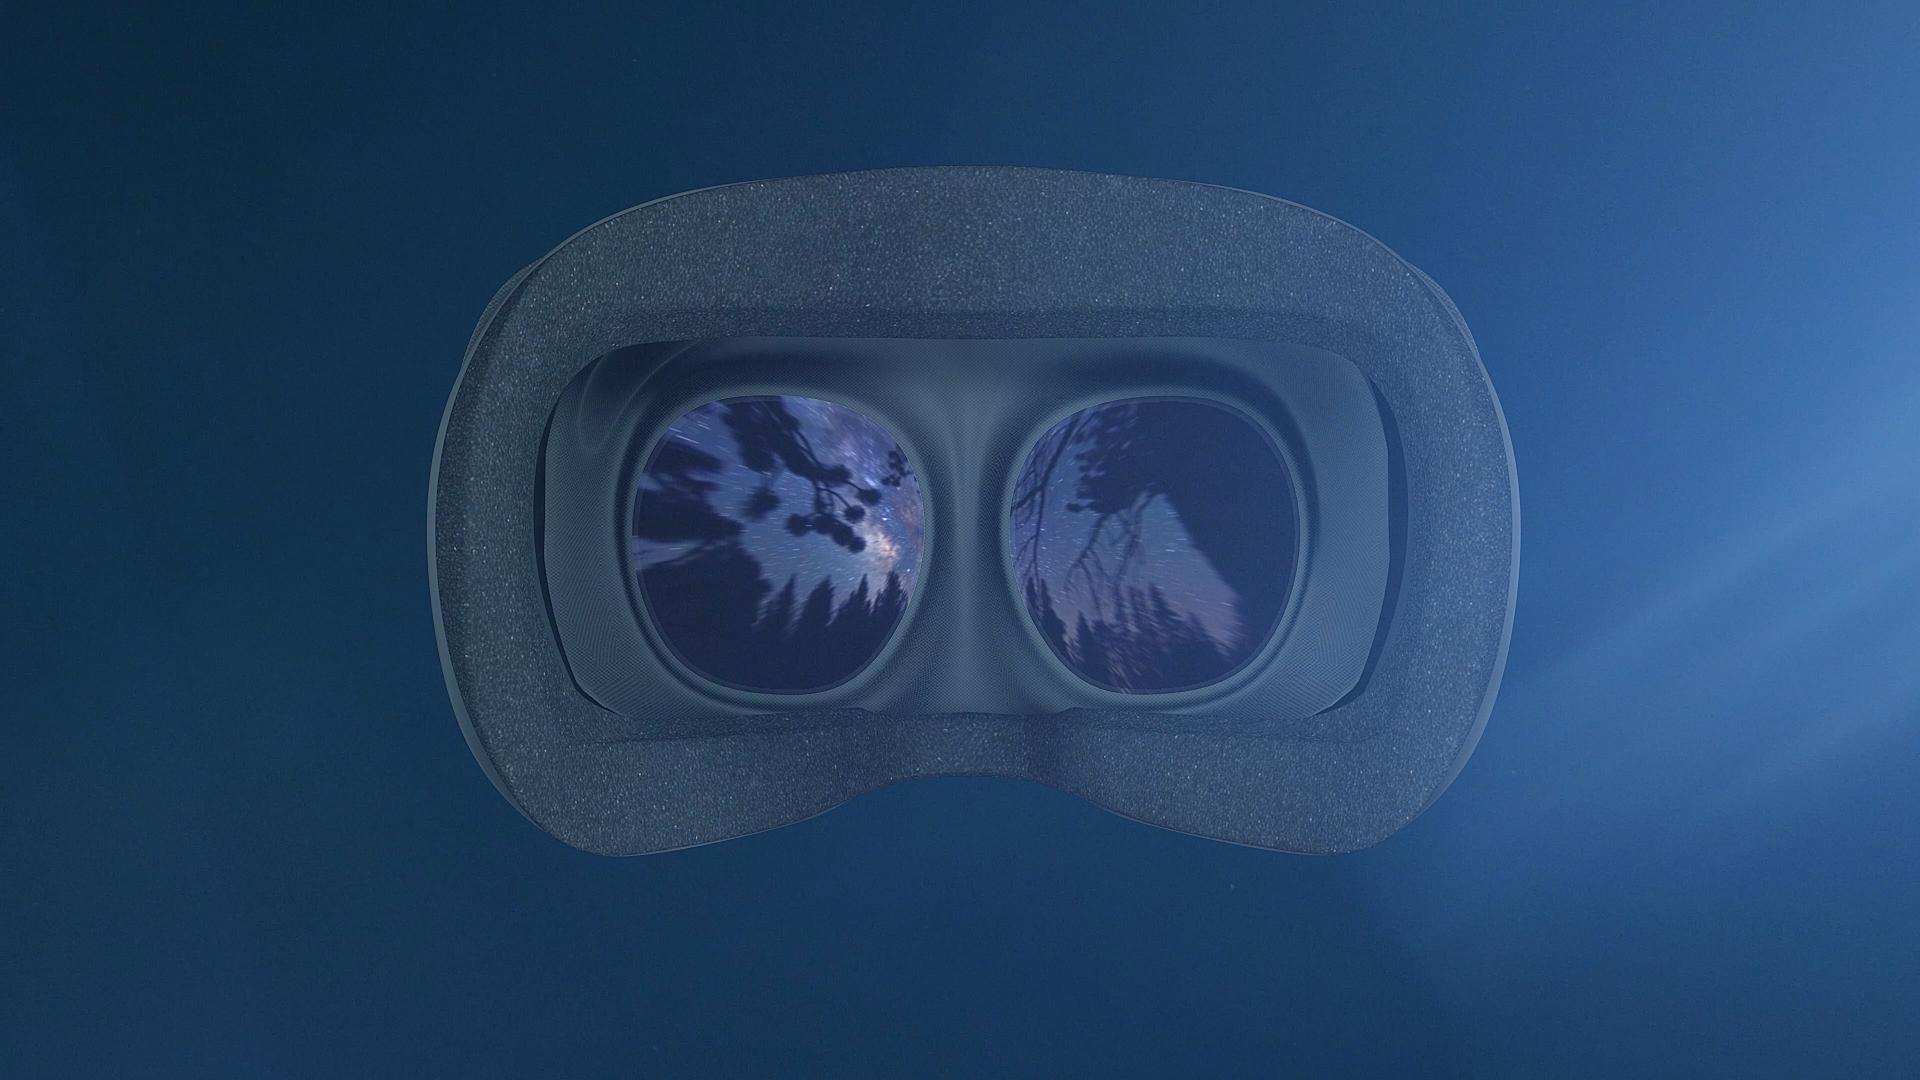 VR_360_Promo_Pitch_1080p_01438